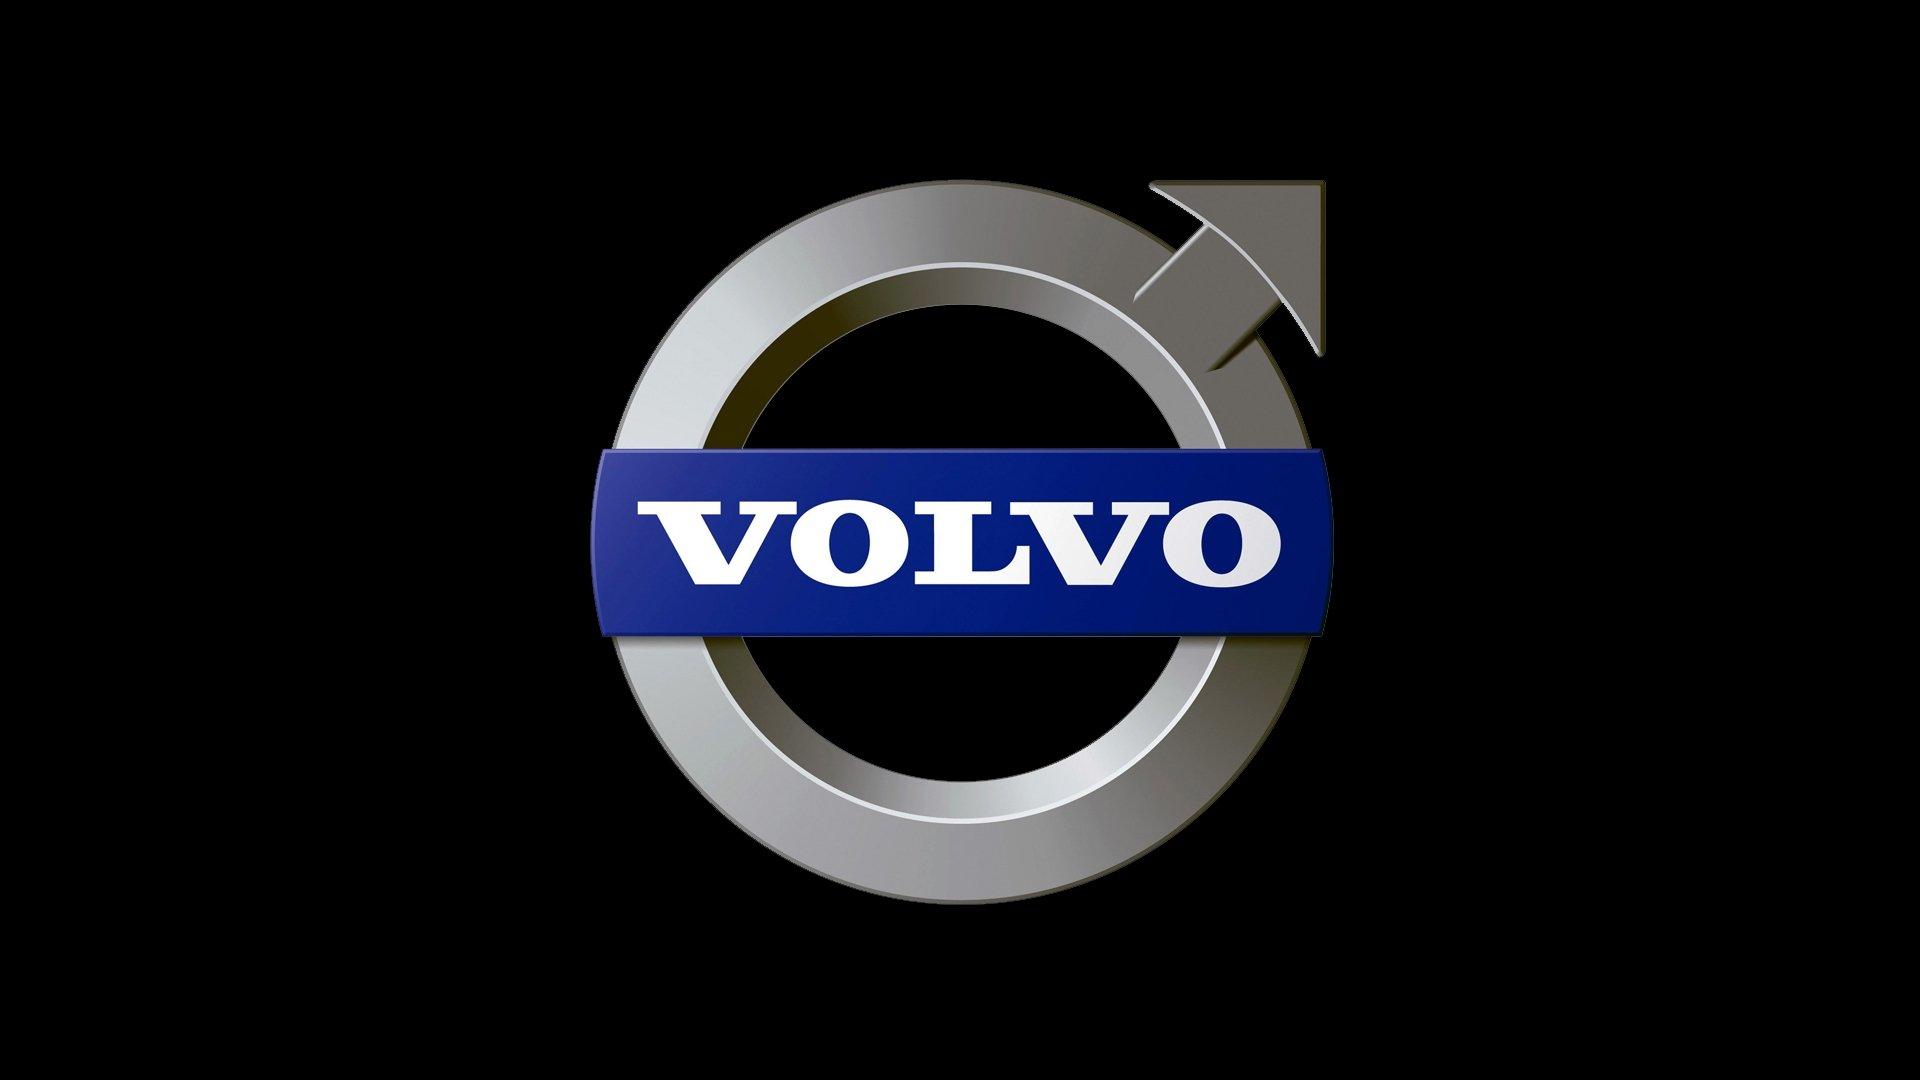 VOLVO- Safe